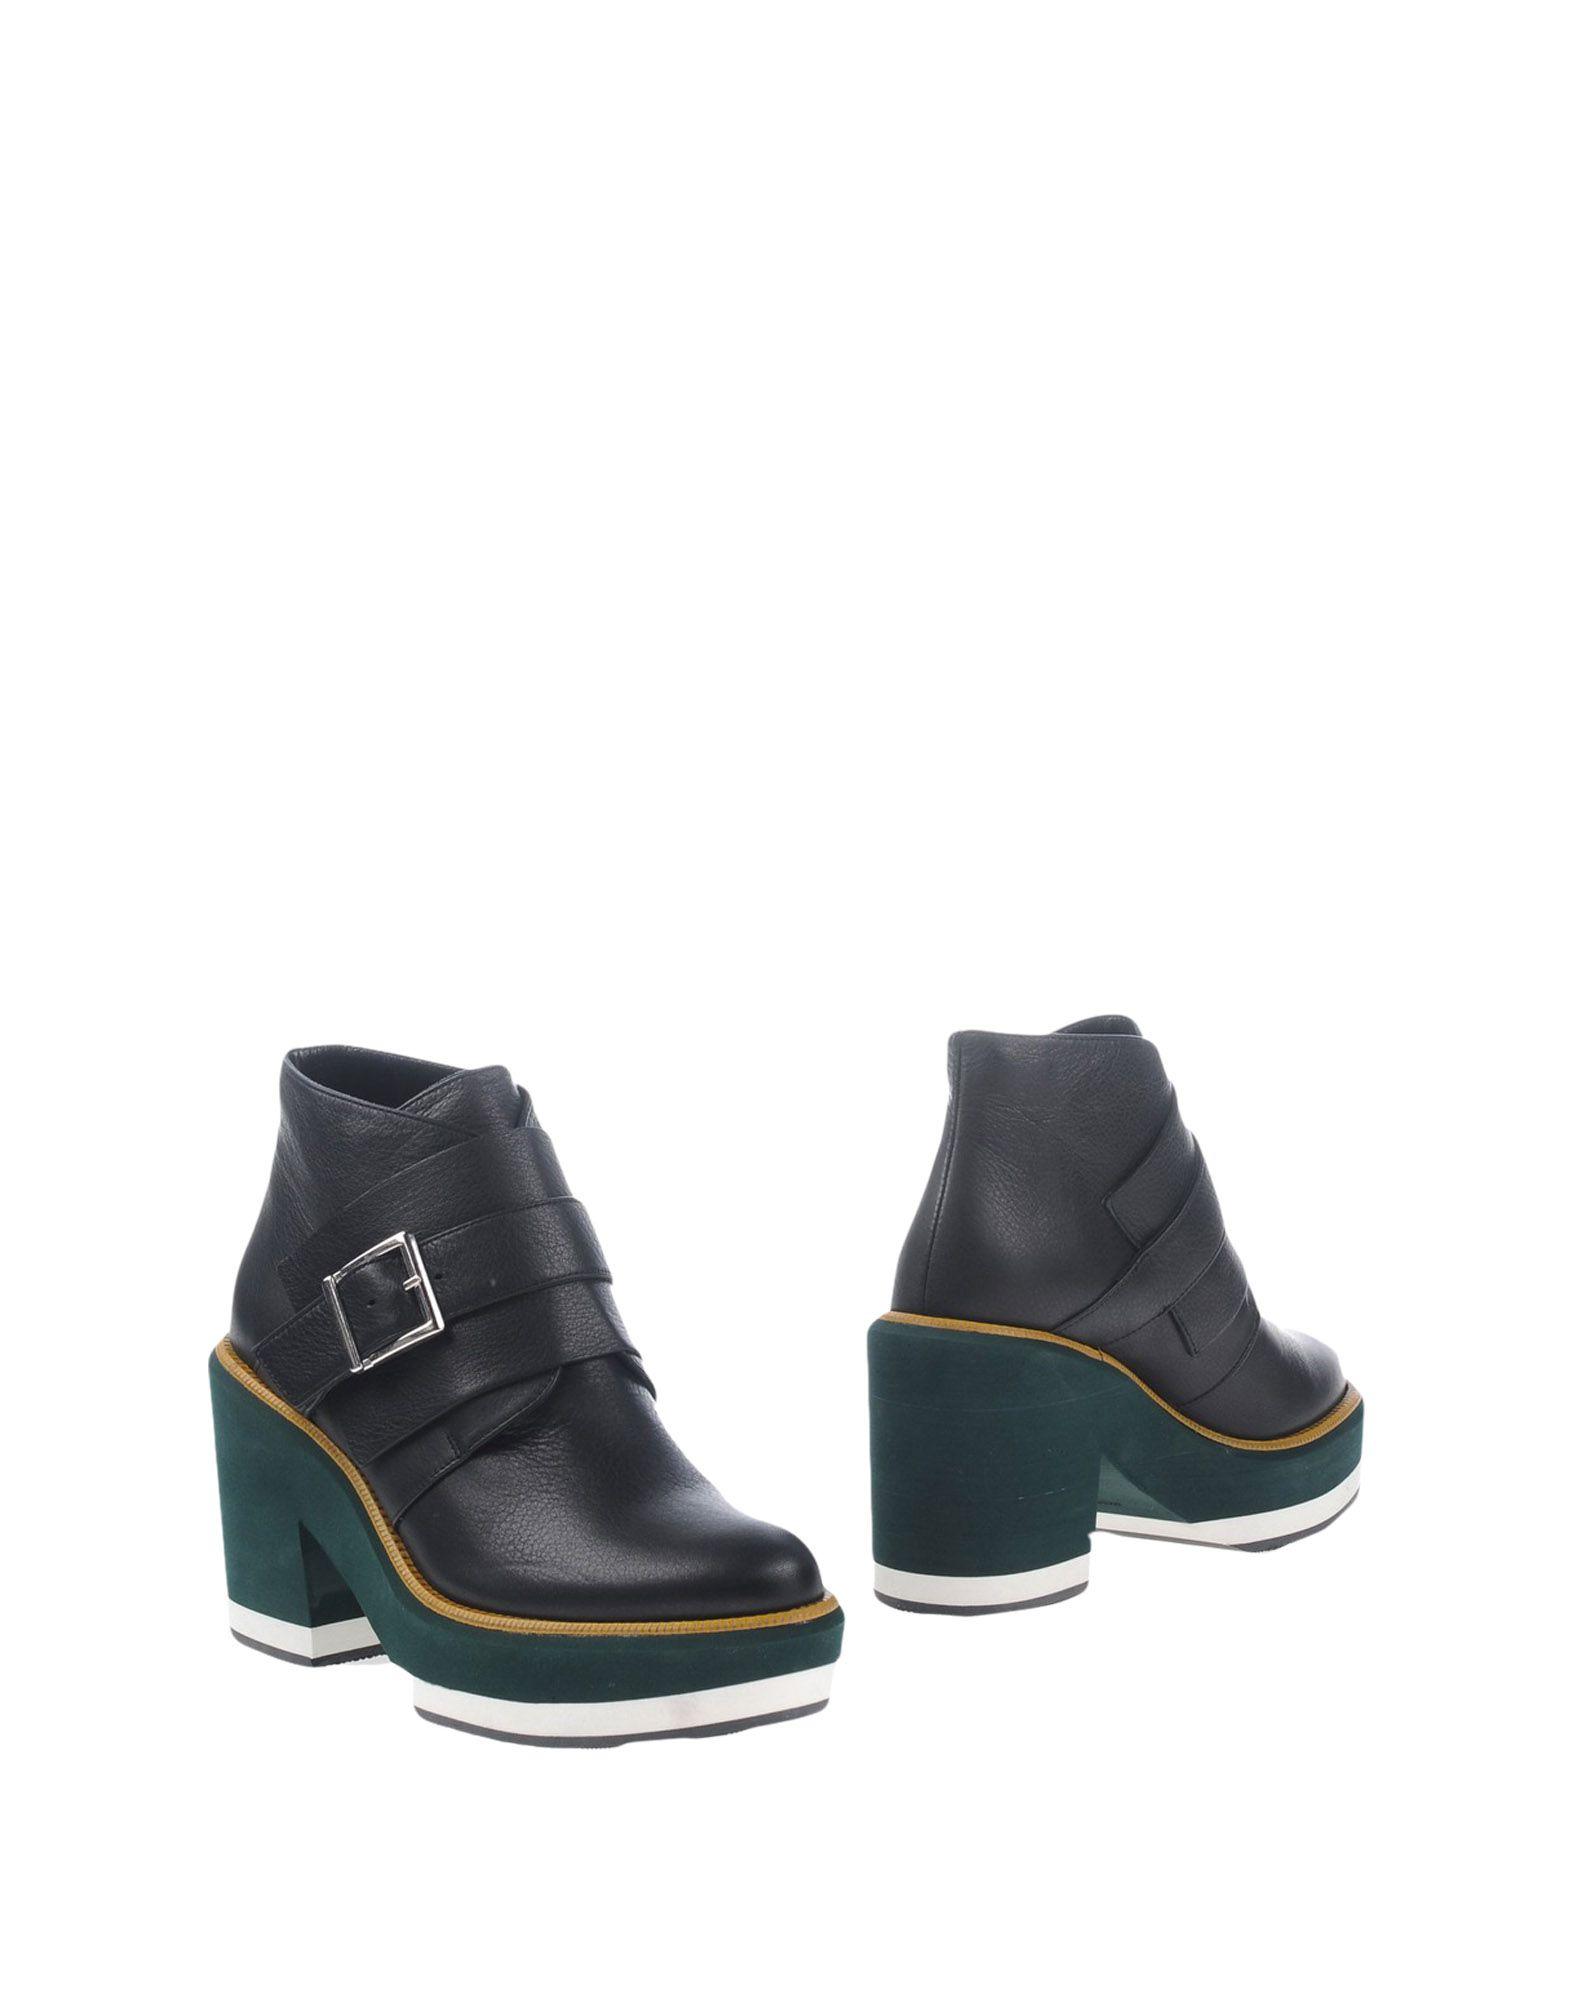 Stilvolle billige Schuhe Damen Paloma Barceló Stiefelette Damen Schuhe  11224192EG 0fe3f0